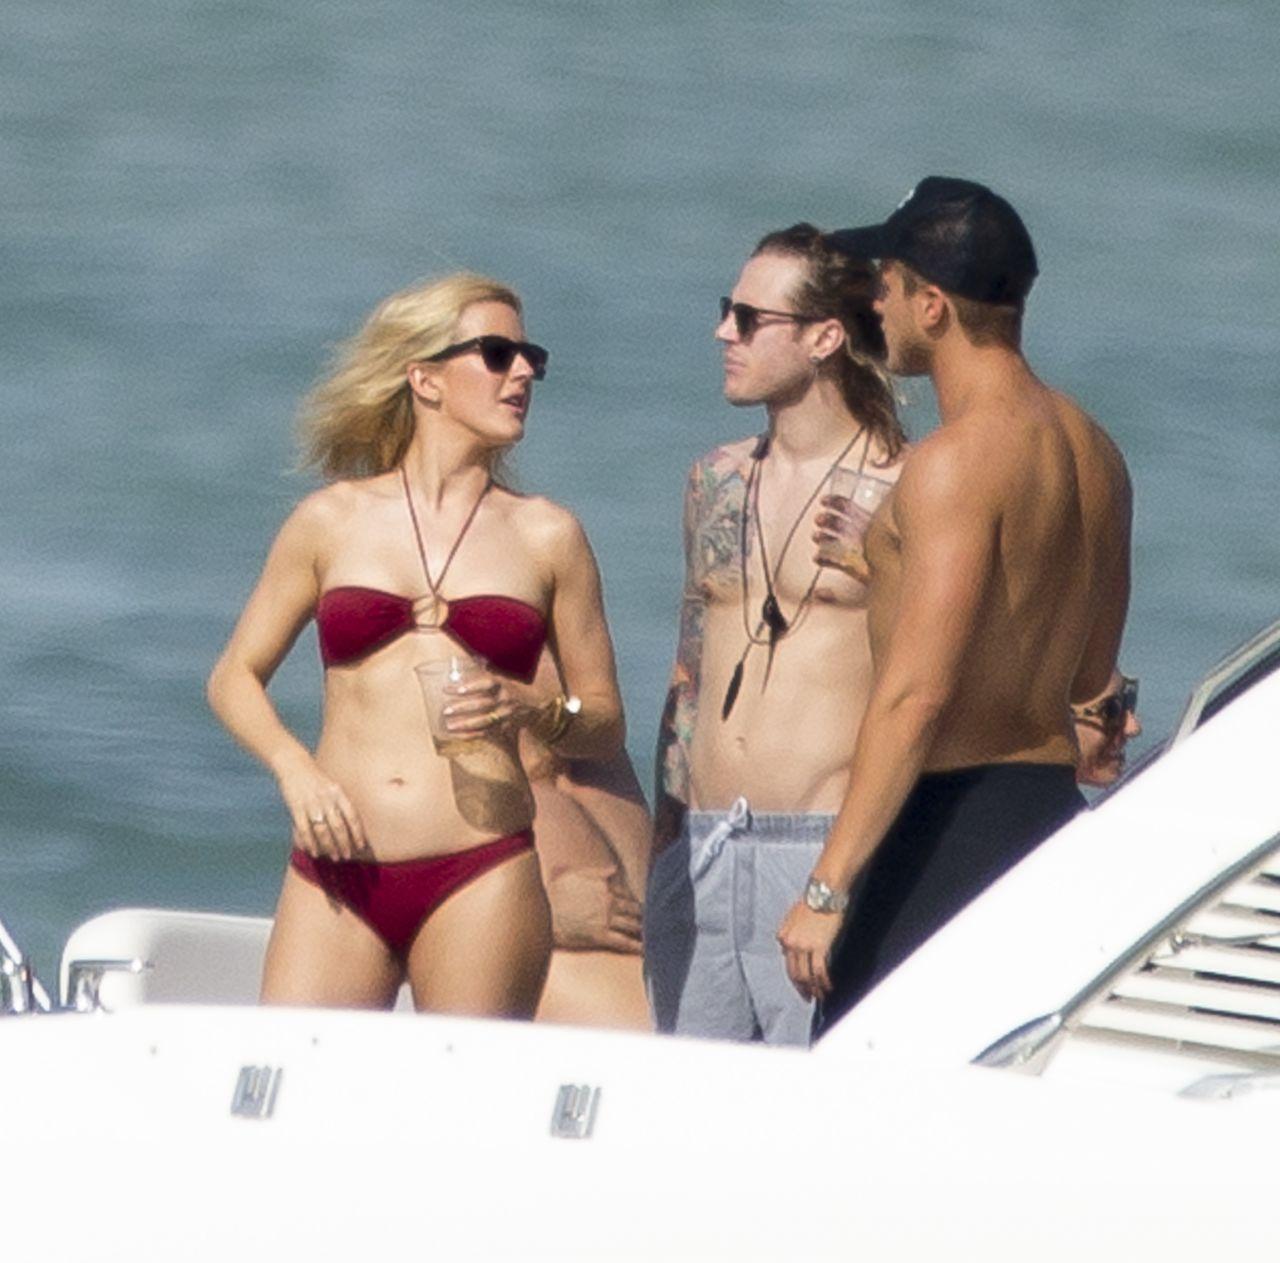 Fappening Ellie Goulding nudes (77 foto and video), Topless, Cleavage, Feet, in bikini 2020